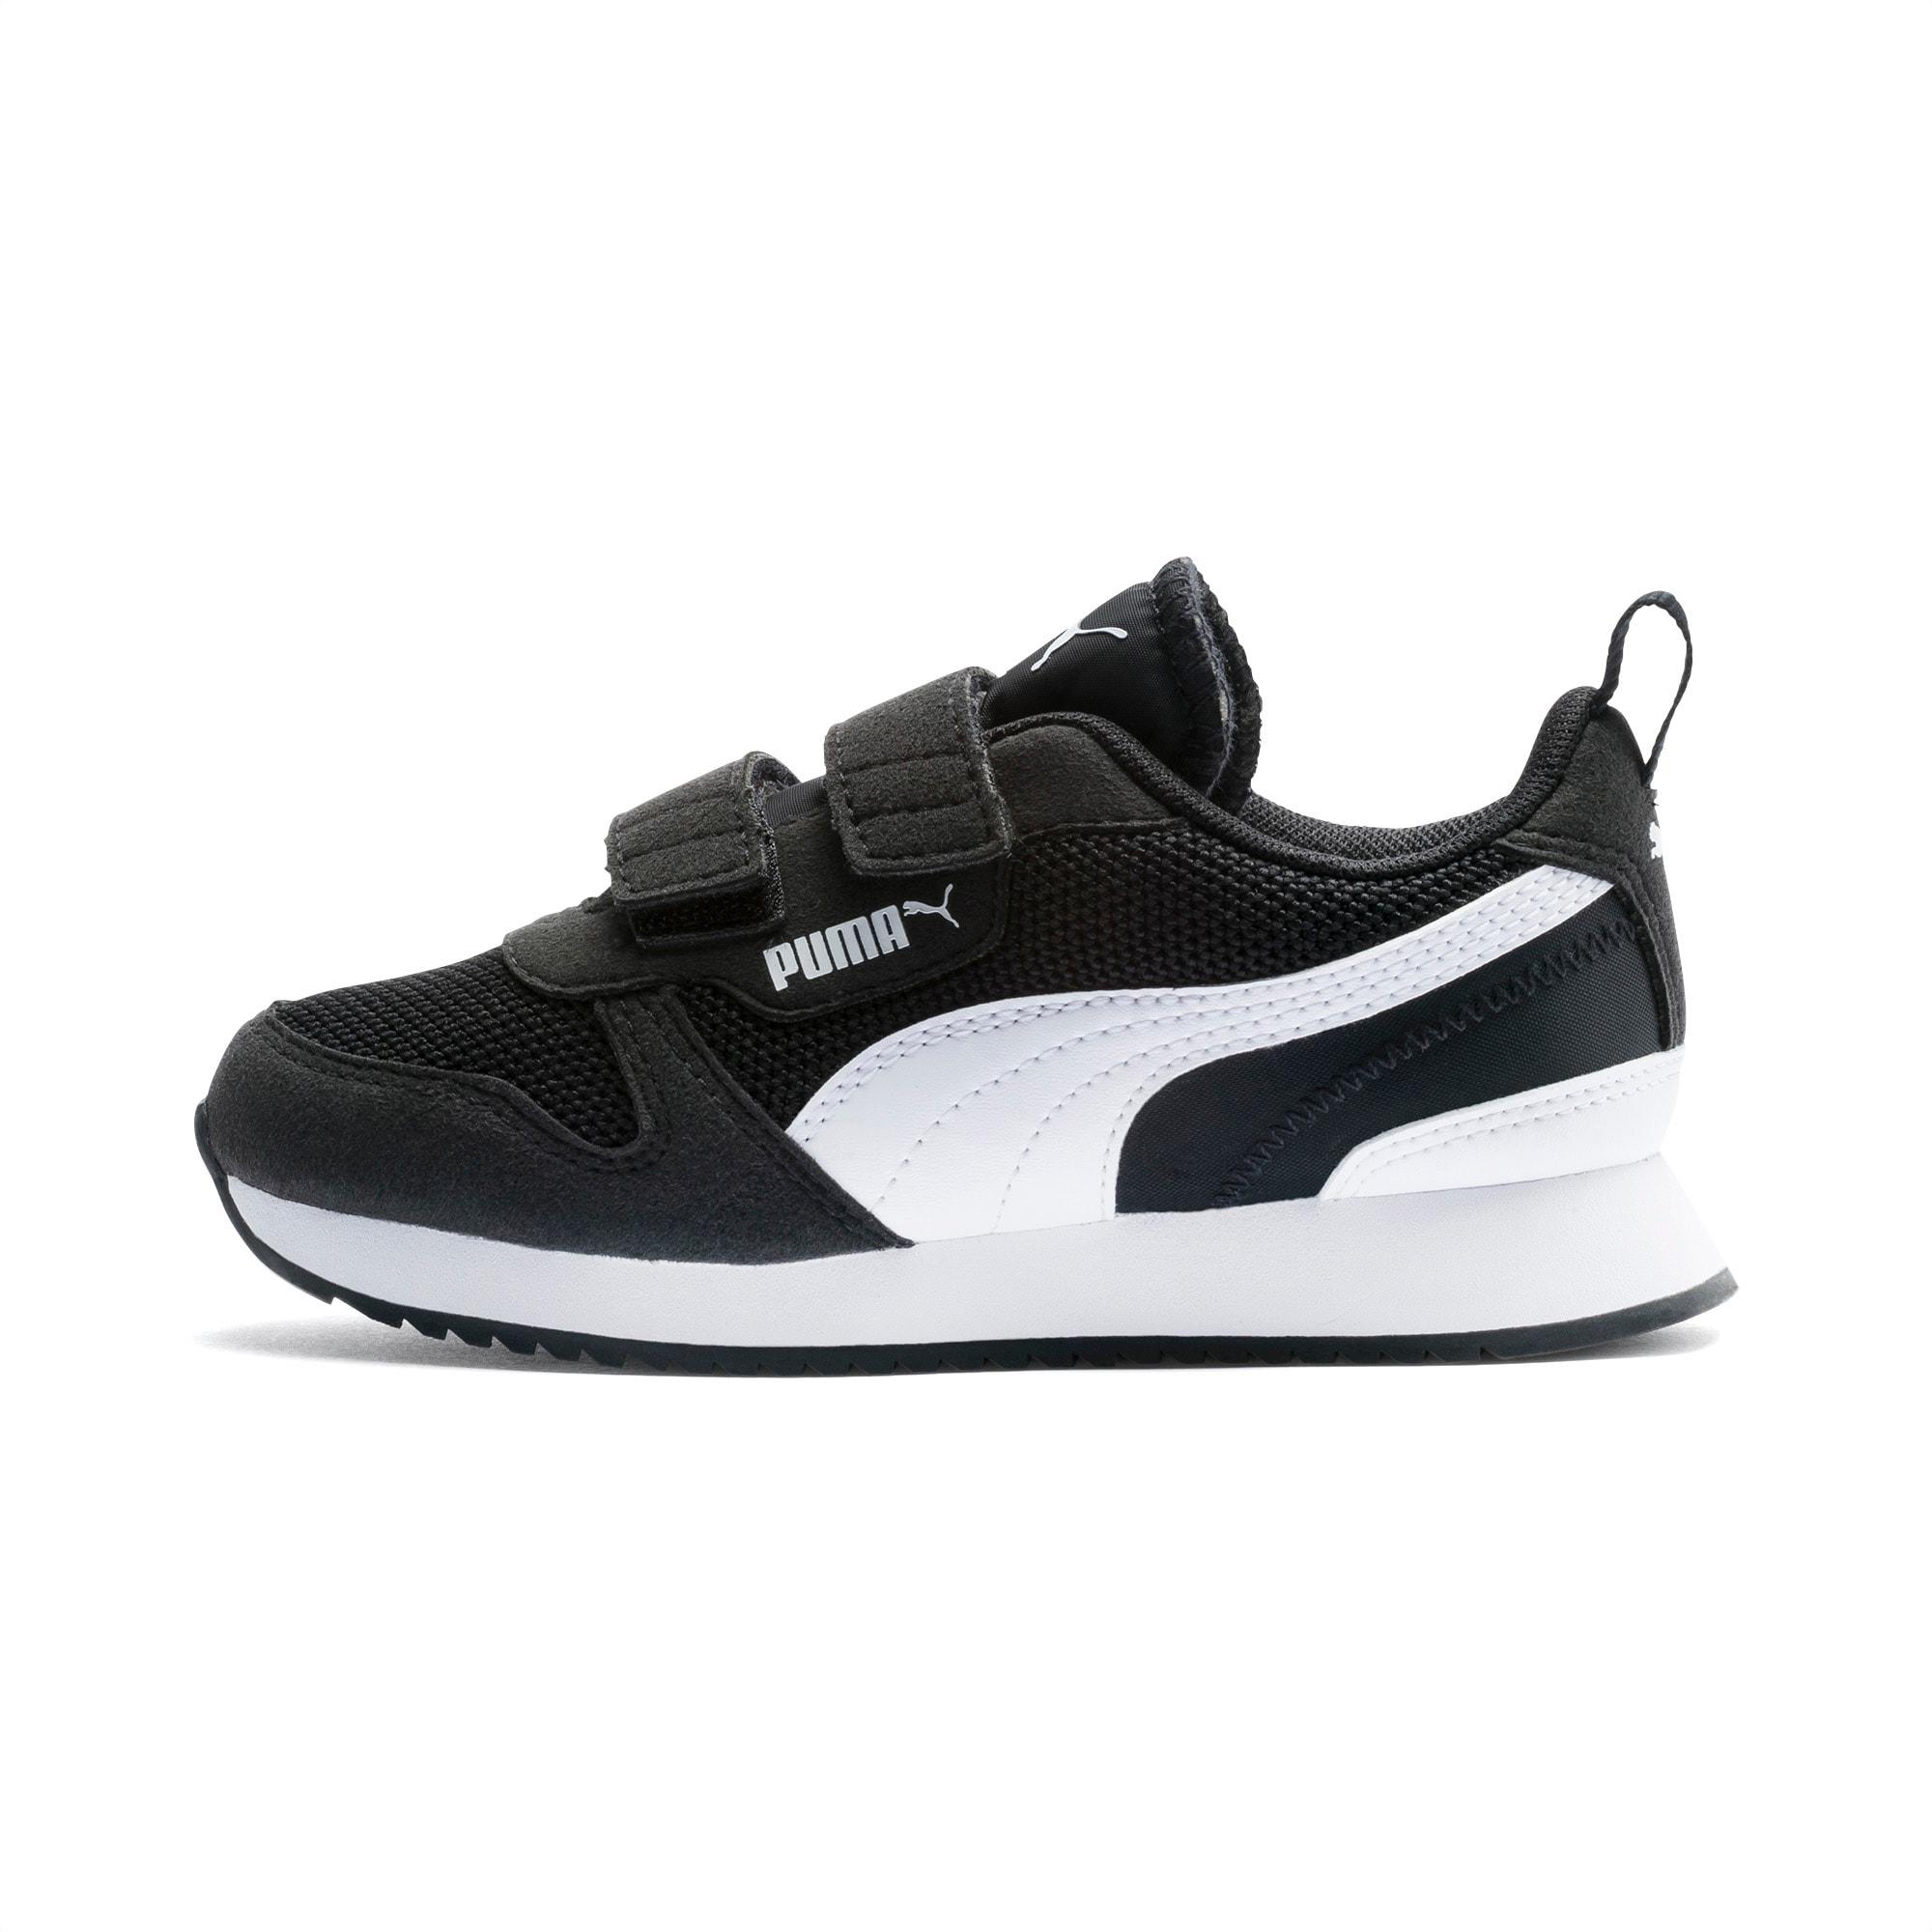 R78 Kids' Trainers   Puma Black-Puma White   PUMA Shoes   PUMA United  Kingdom